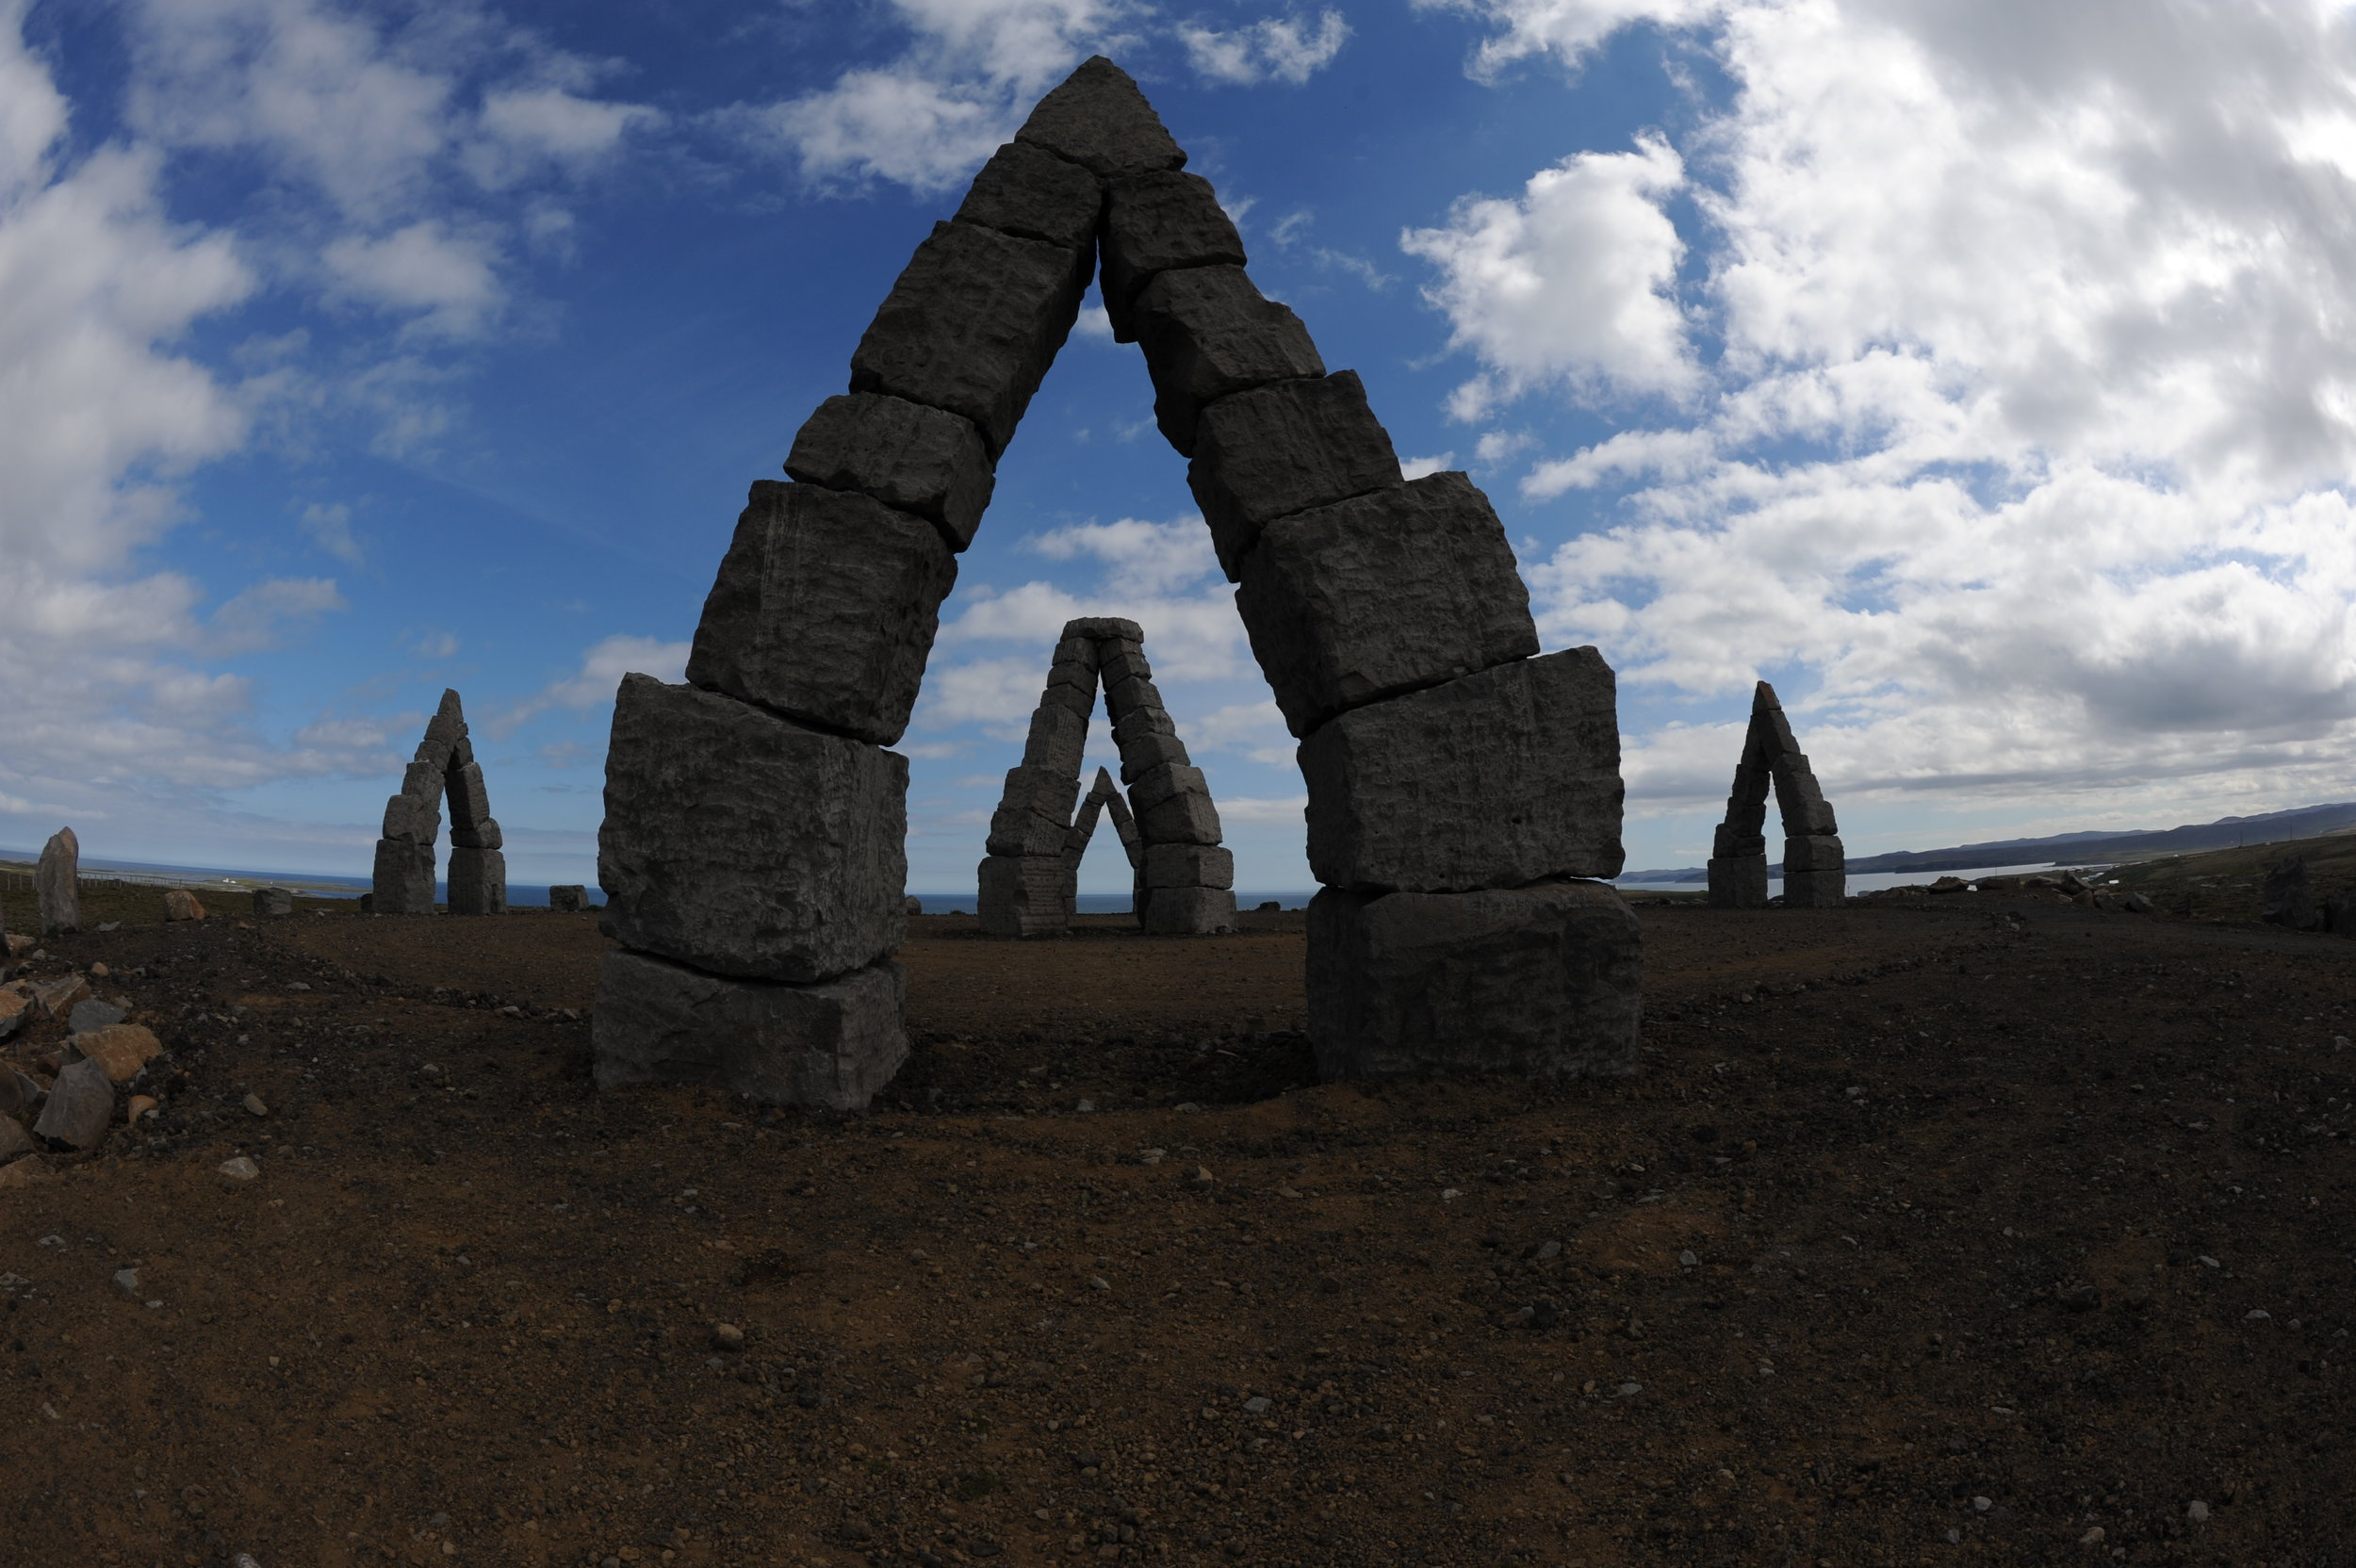 The Stonehenge of the North